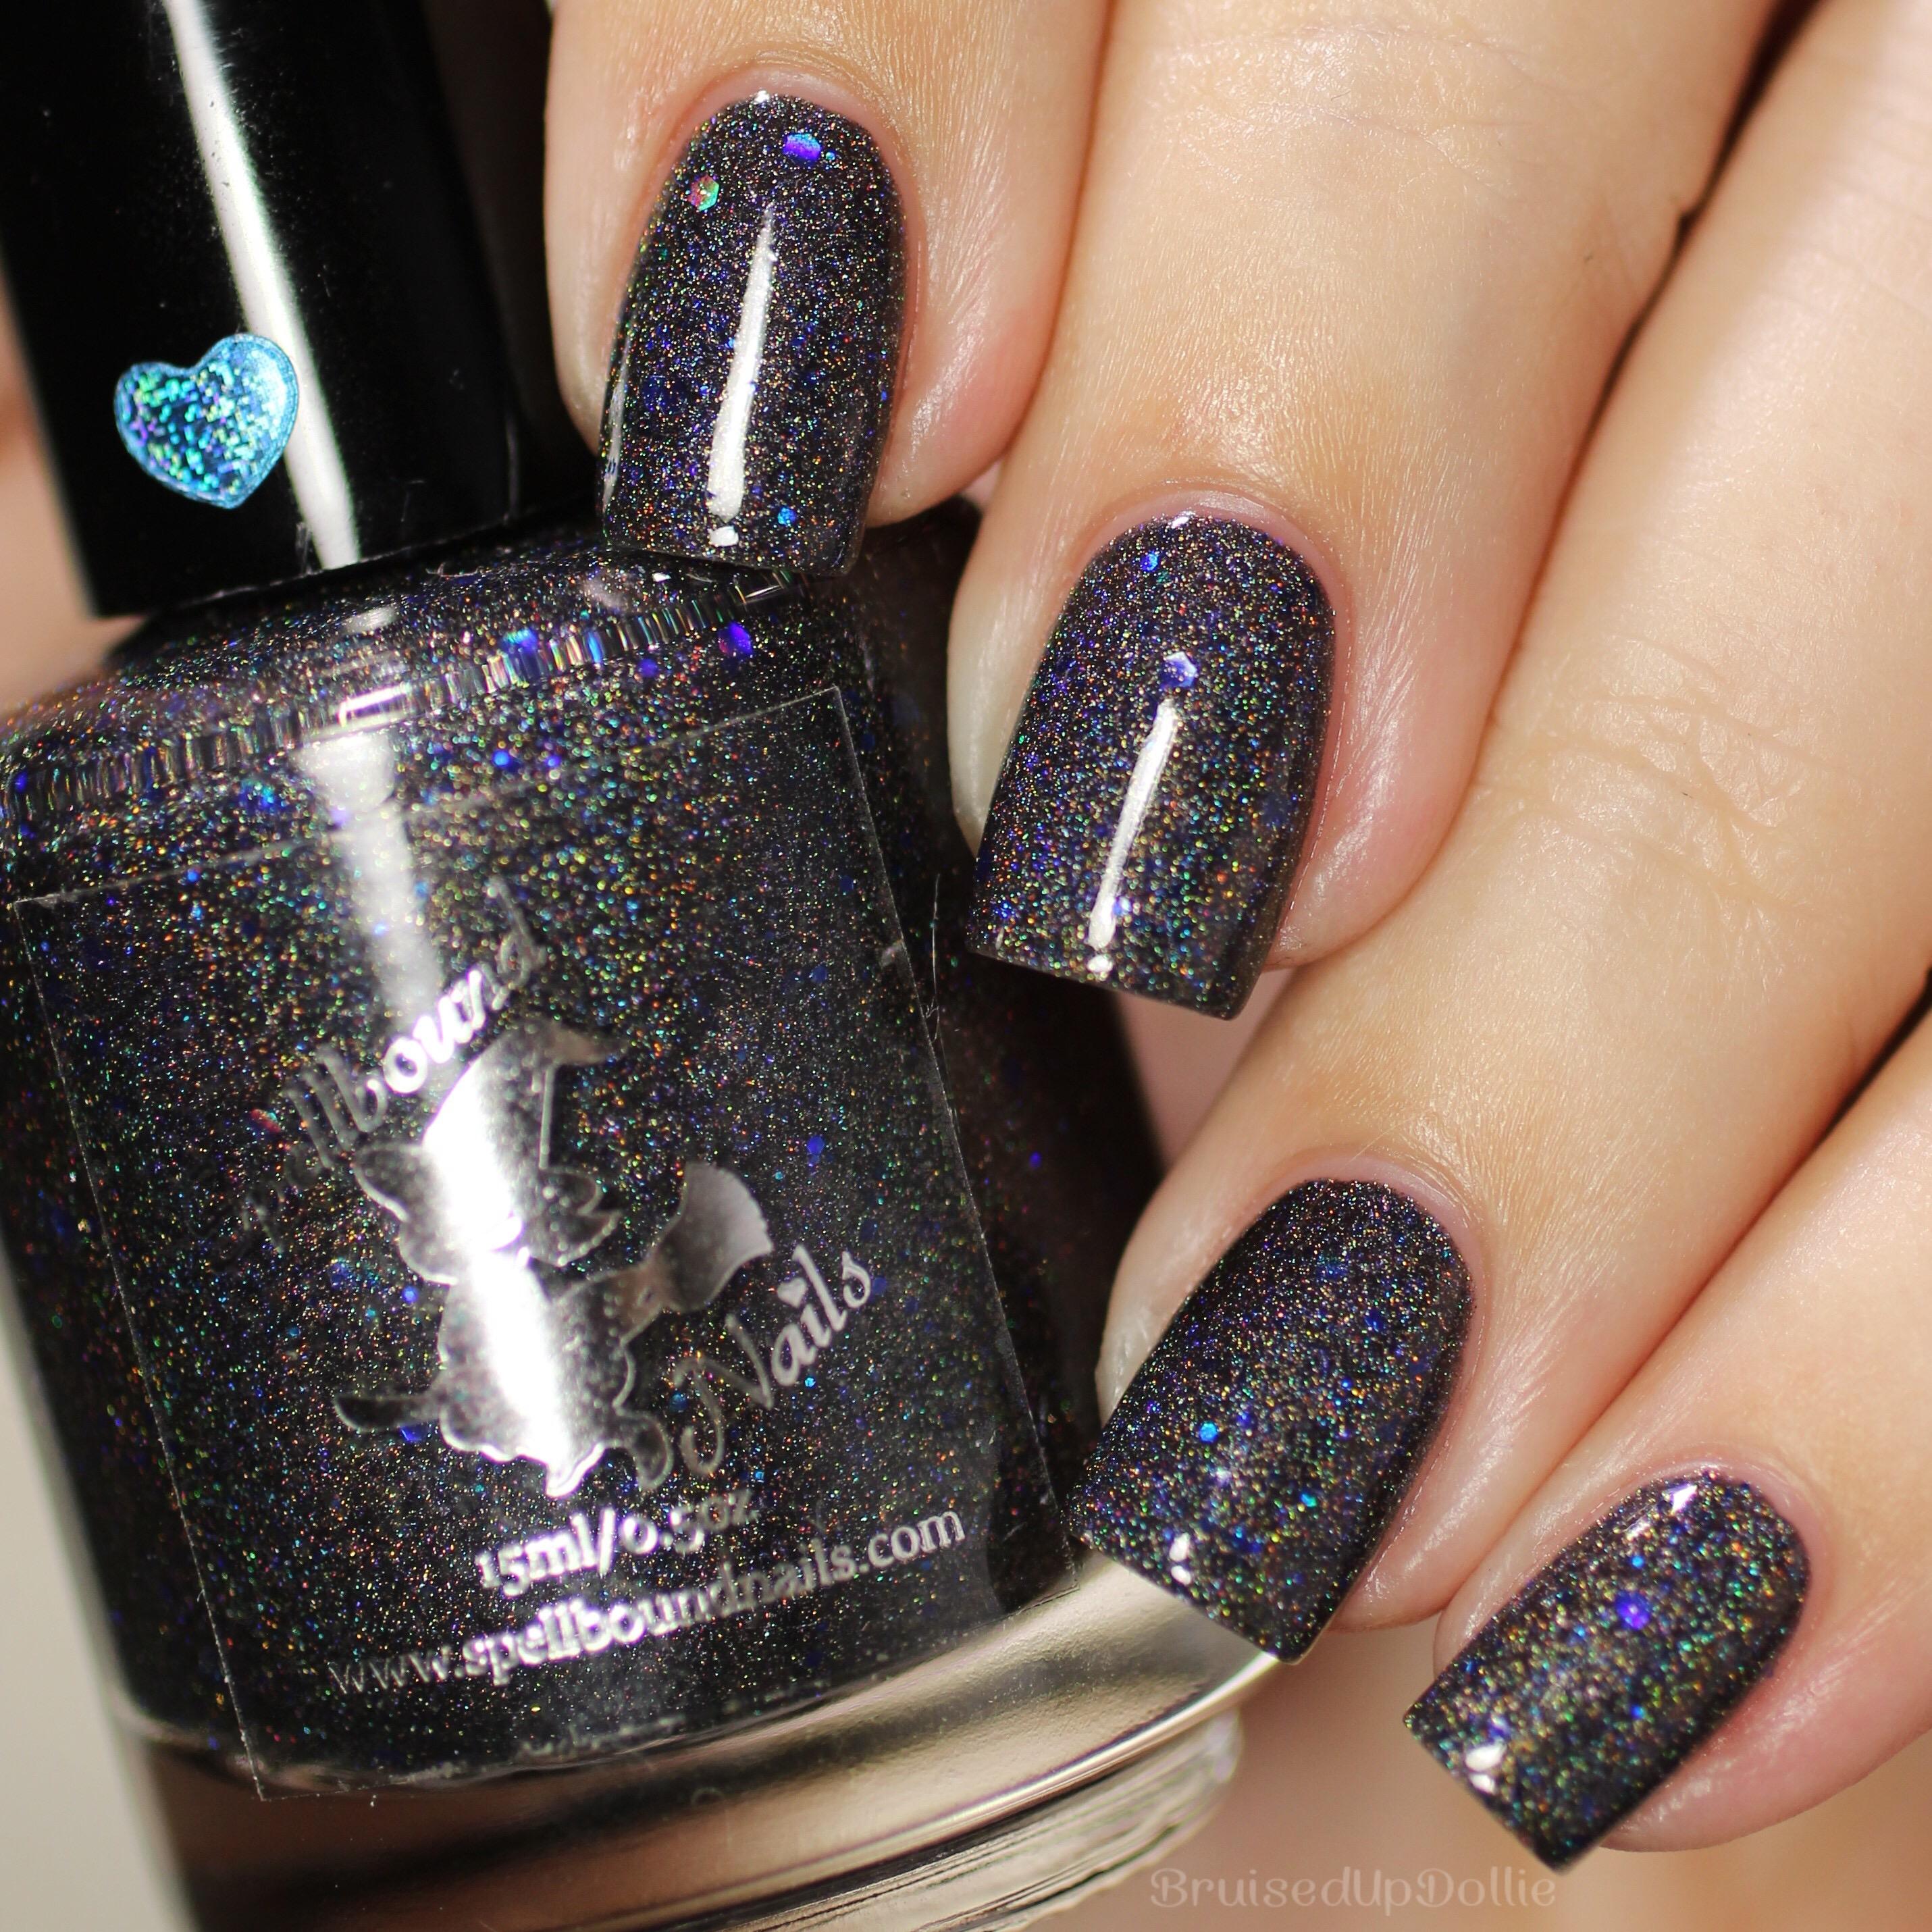 Dementor Custom Harry Potter Inspired Black Holo Holographic Navy Blue Glitter Nail Polish